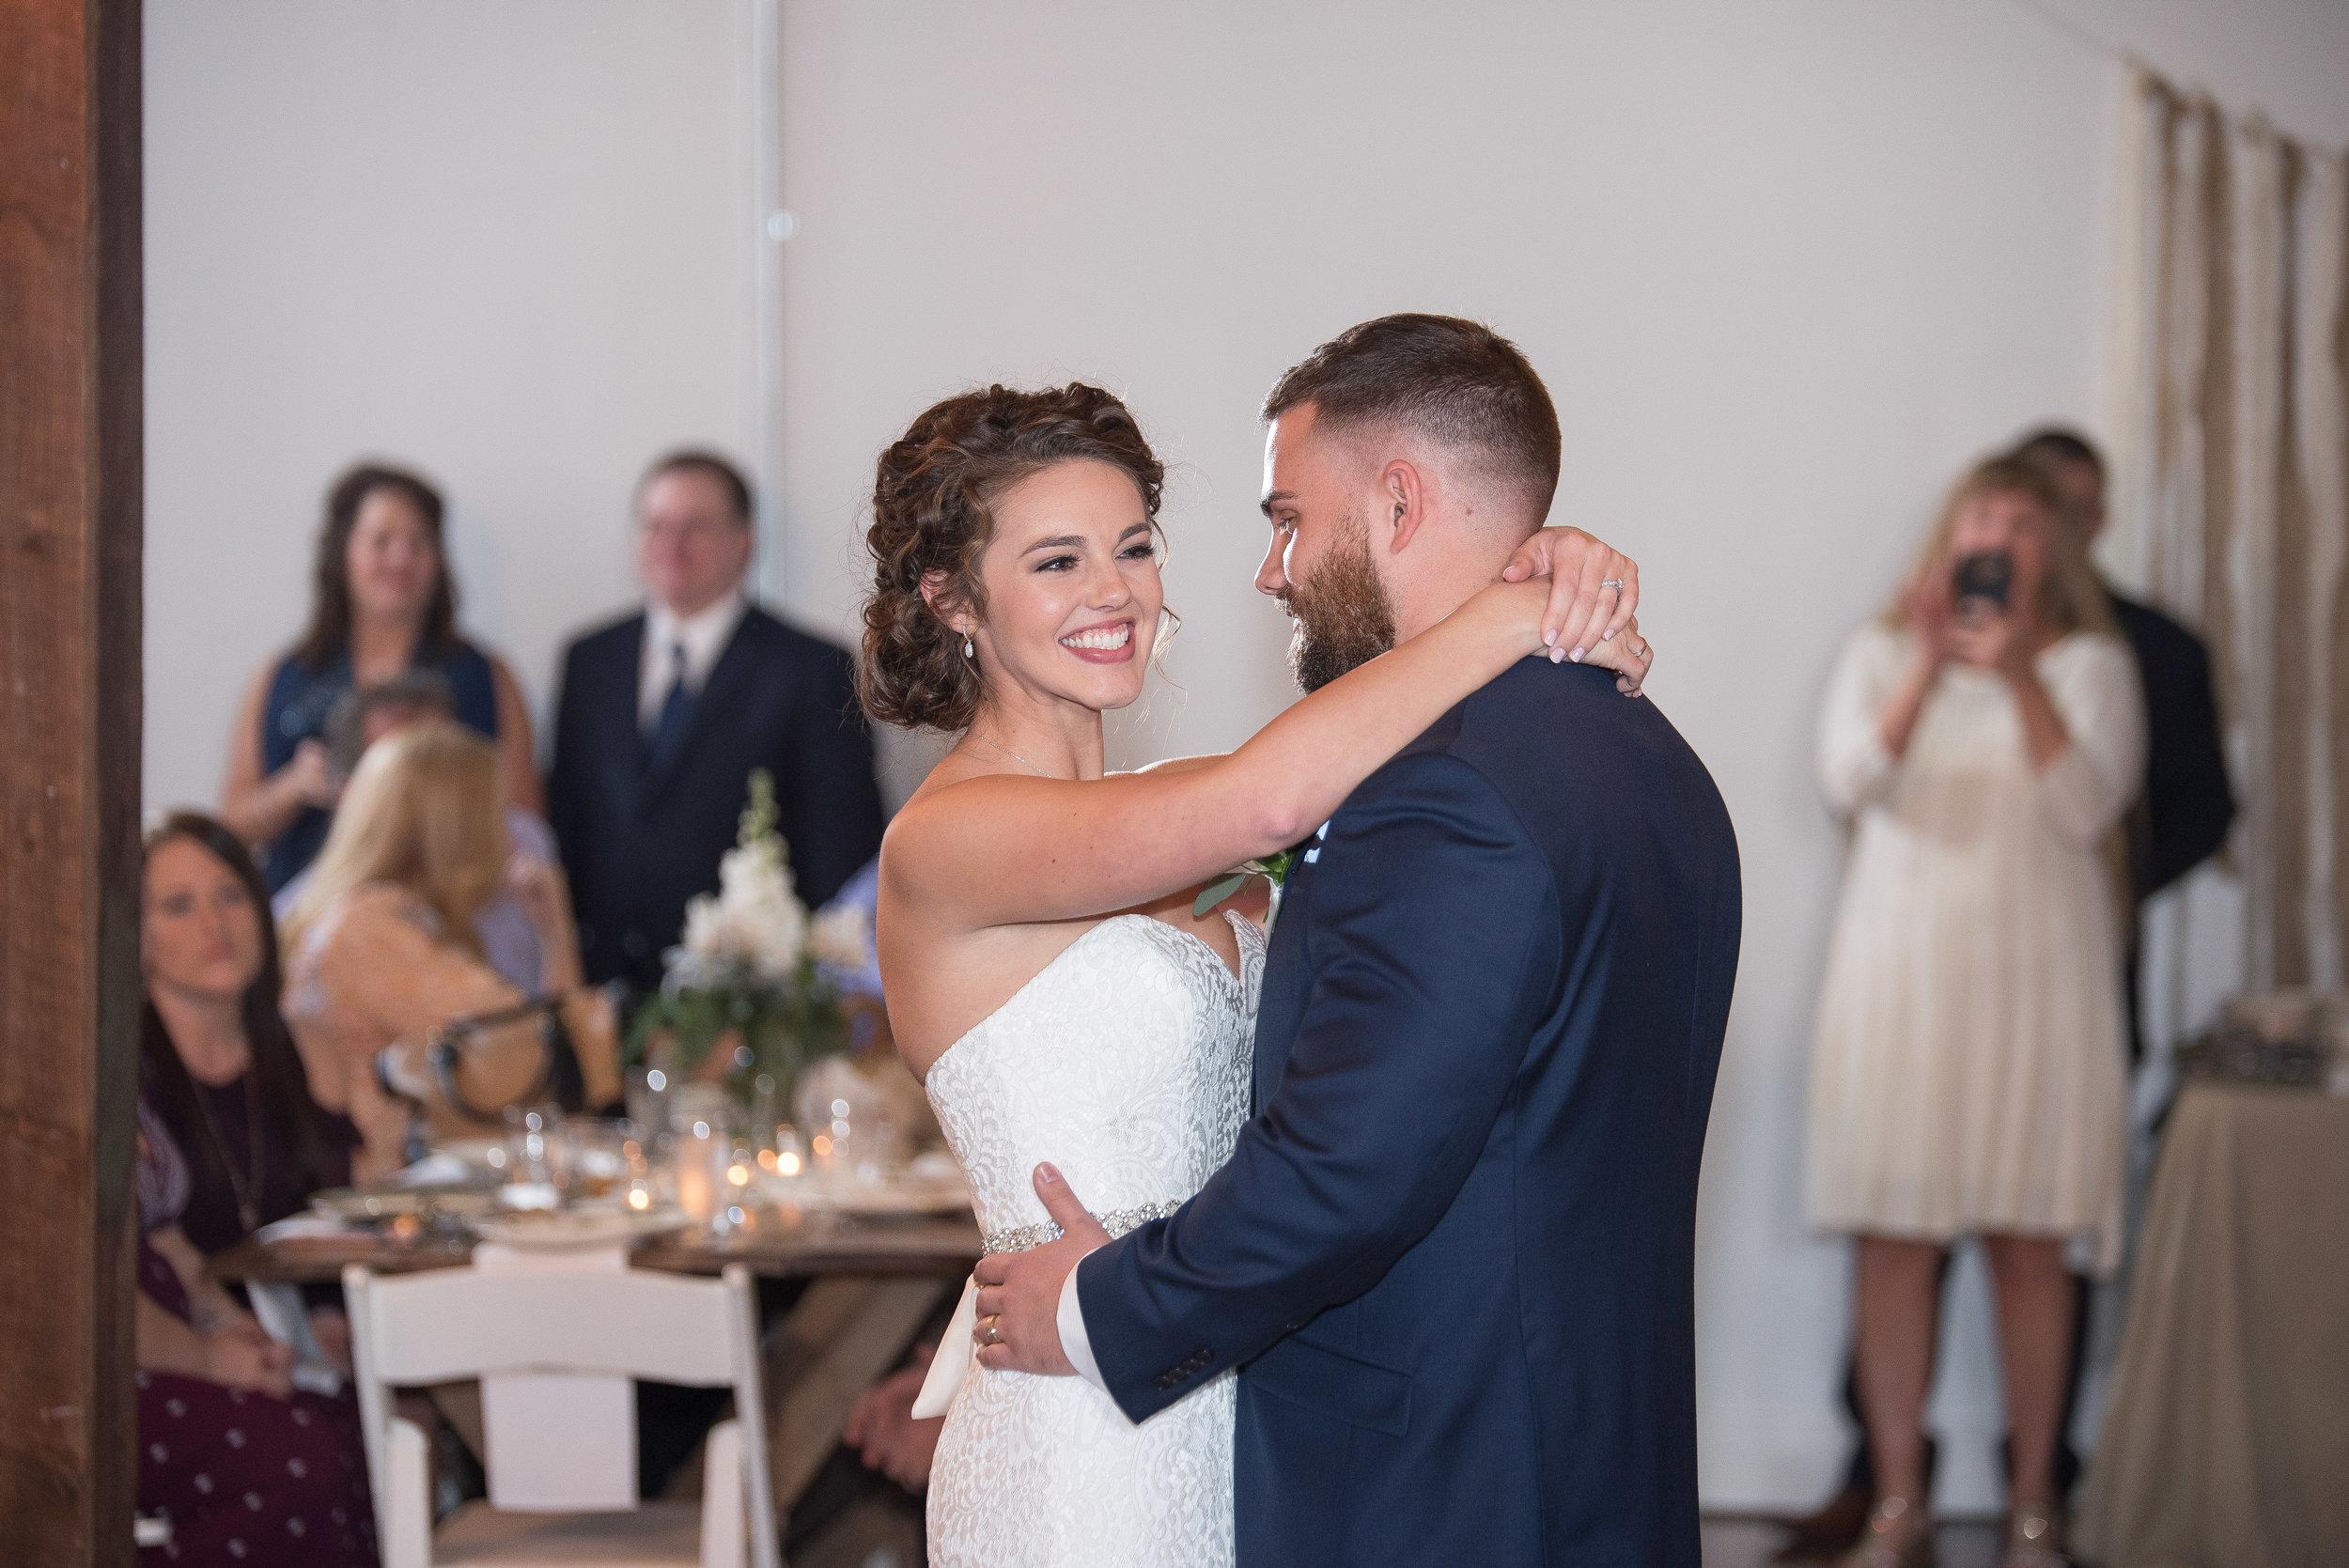 The Roller Mill Events - Winston Salem Weddings - NC Weddings - High Point NC Weddings - Winston Salem Venue - Yasmin Leonard Photography-65.jpg